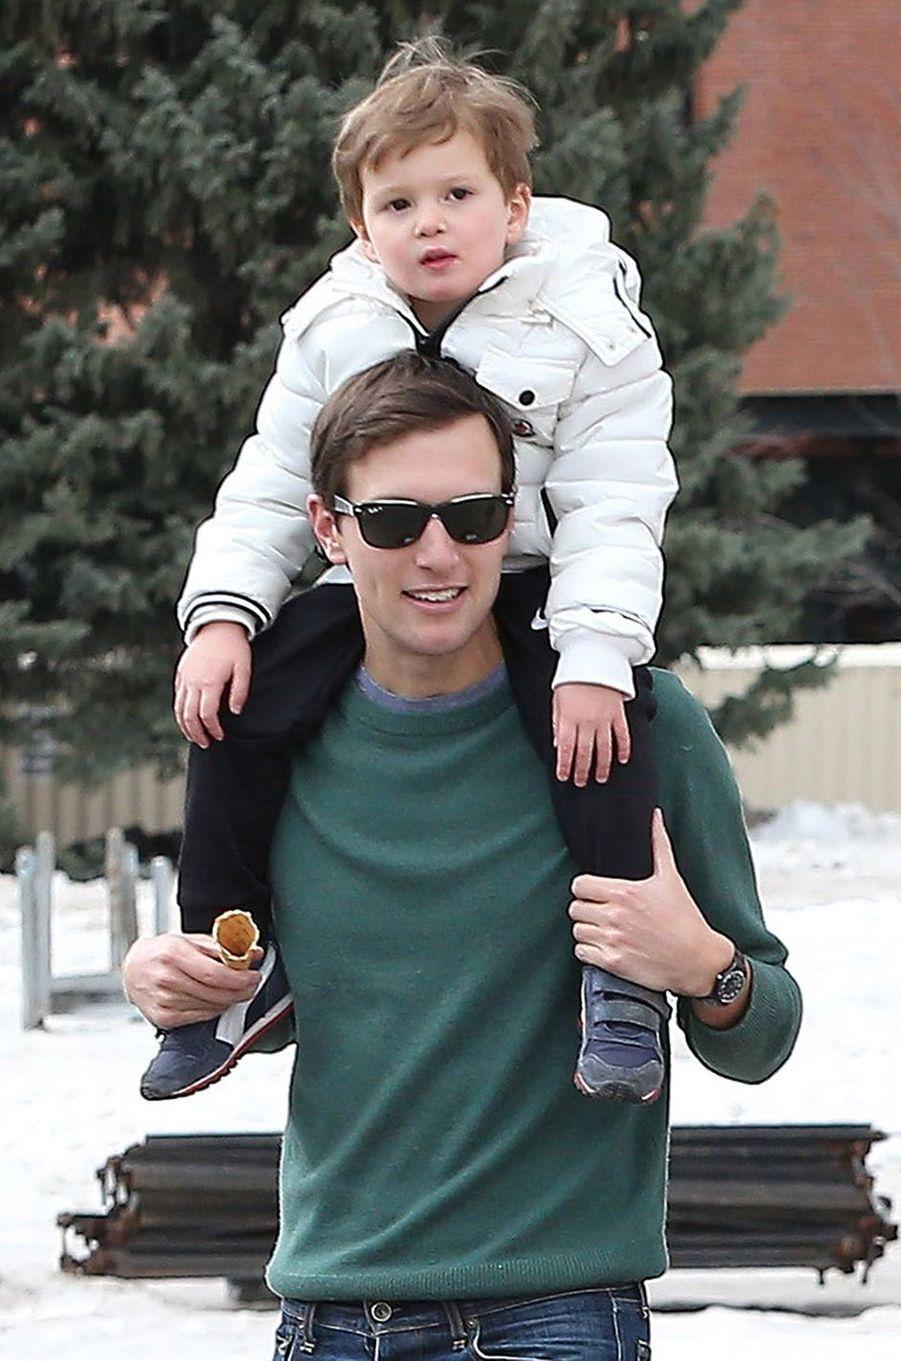 Ivanka Trump et son mari Jared Kushner en vacances à Aspen avec leurs enfants.